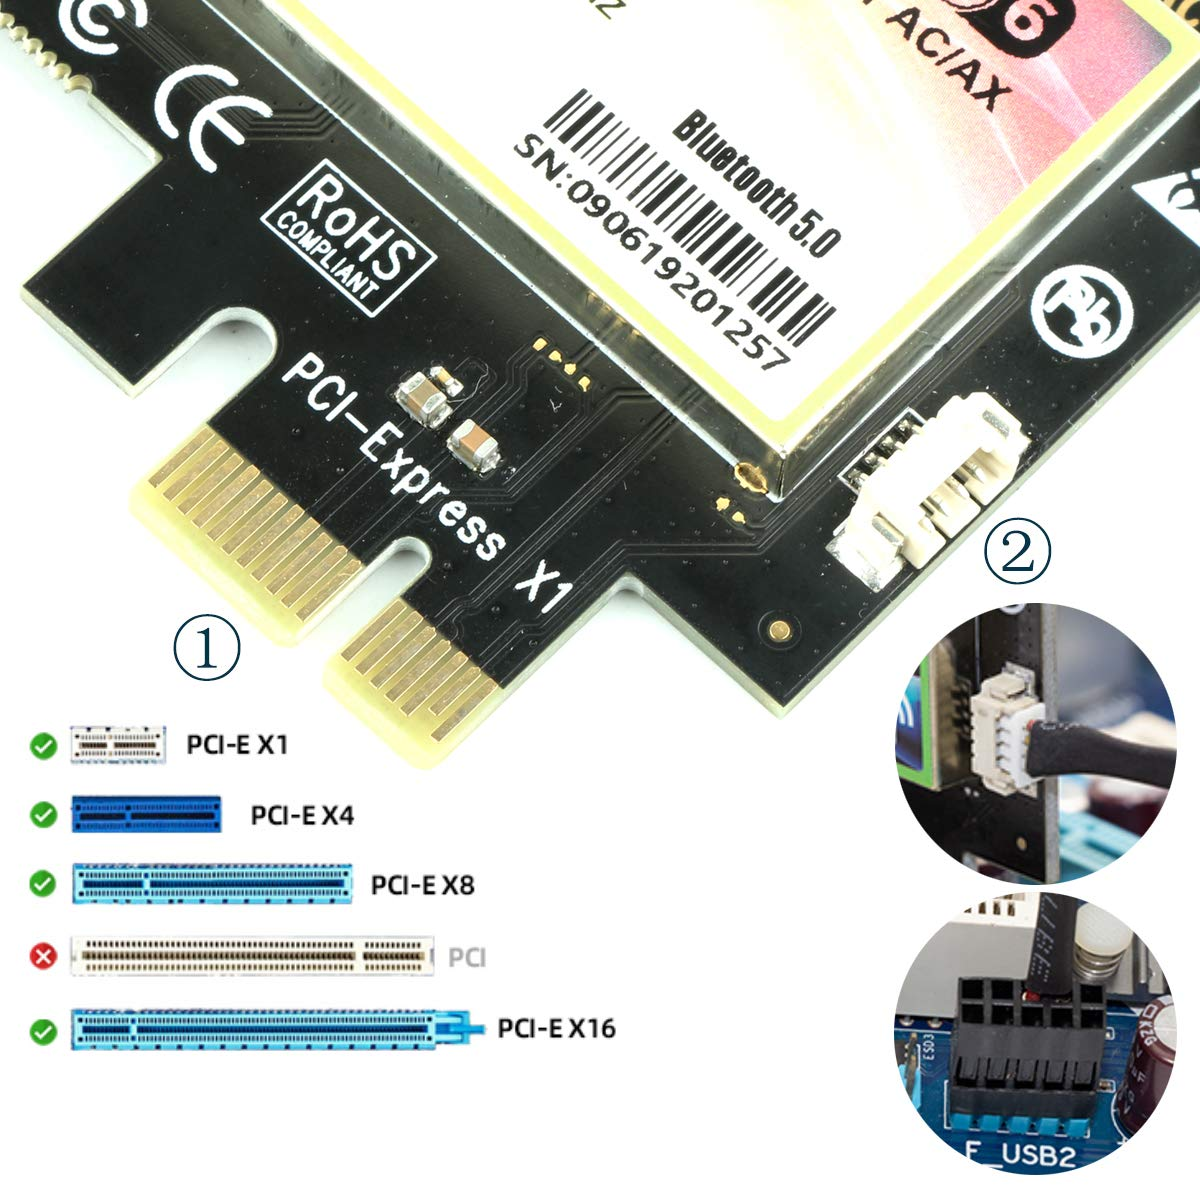 Ubit AX WiFi 6 WiFi Card Dual Band 3000 Mbps AX200 PCIE Wireless WLAN WiFi Card with Bluetooth 5.1 | MU-MIMO| OFDMA| Ultra-Low Latency(Suport Win 10 64bit only)